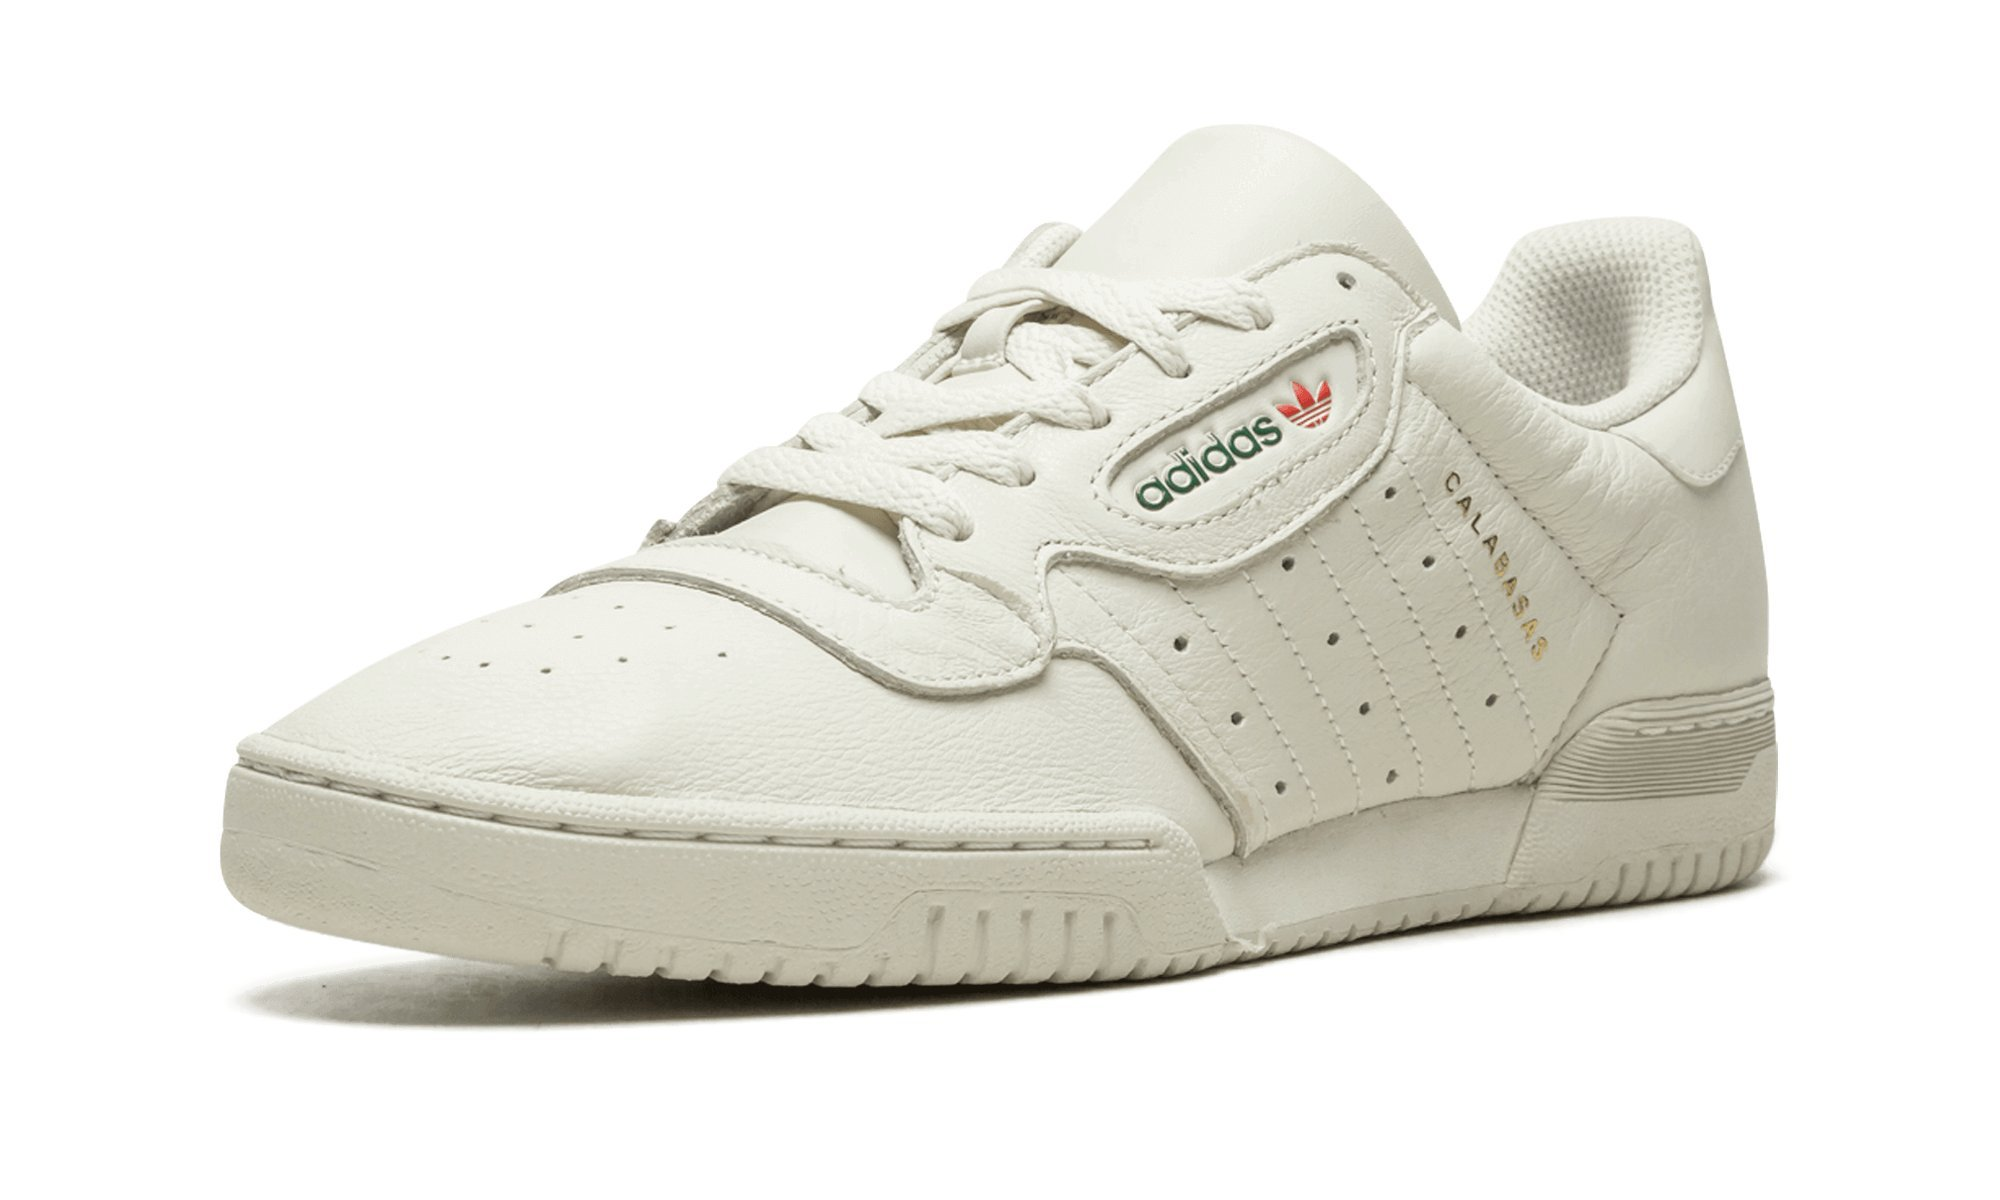 7b058e6a82f Galleon - Adidas Mens Yeezy Powerphase Calabasas Cream White Leather Size 13